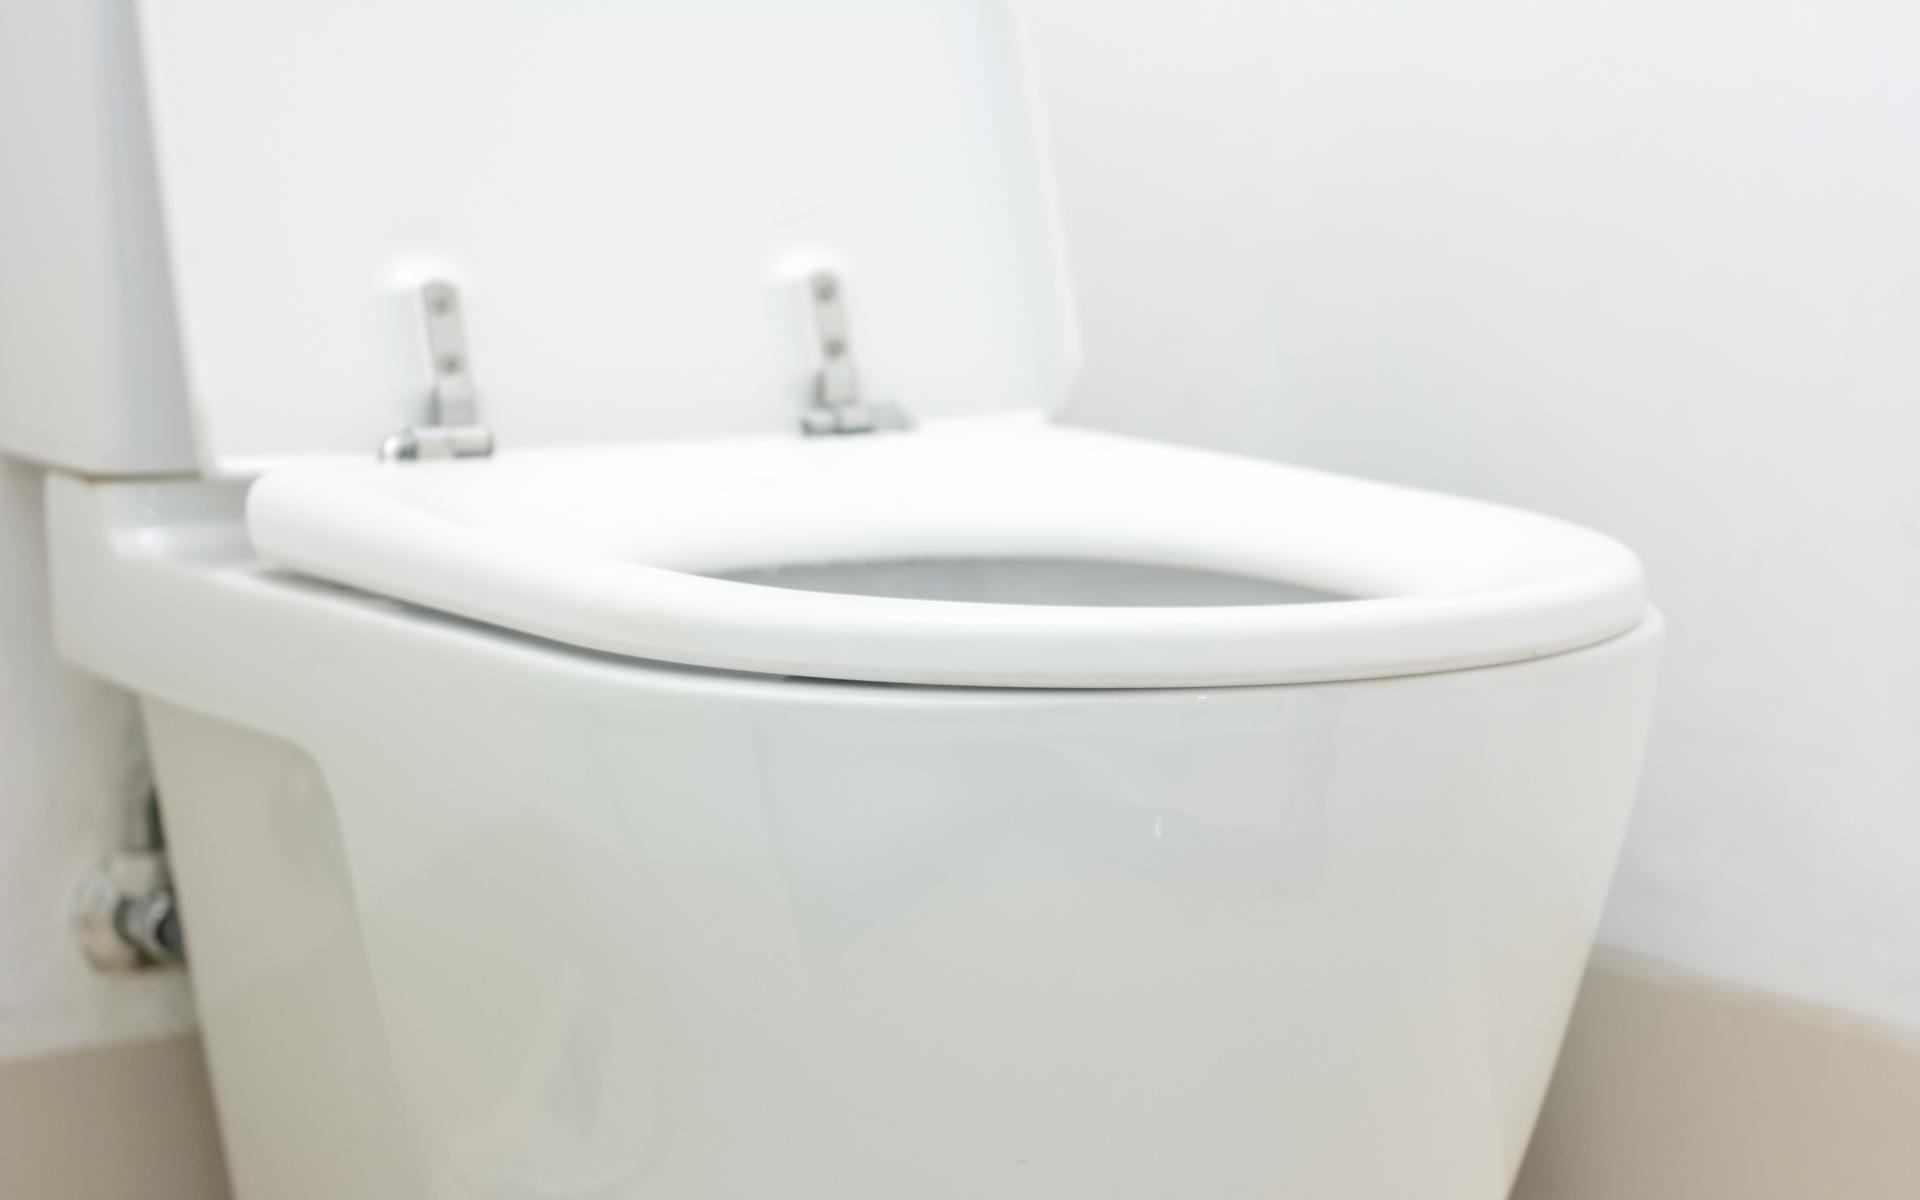 Stansbury Park Toilet Repair